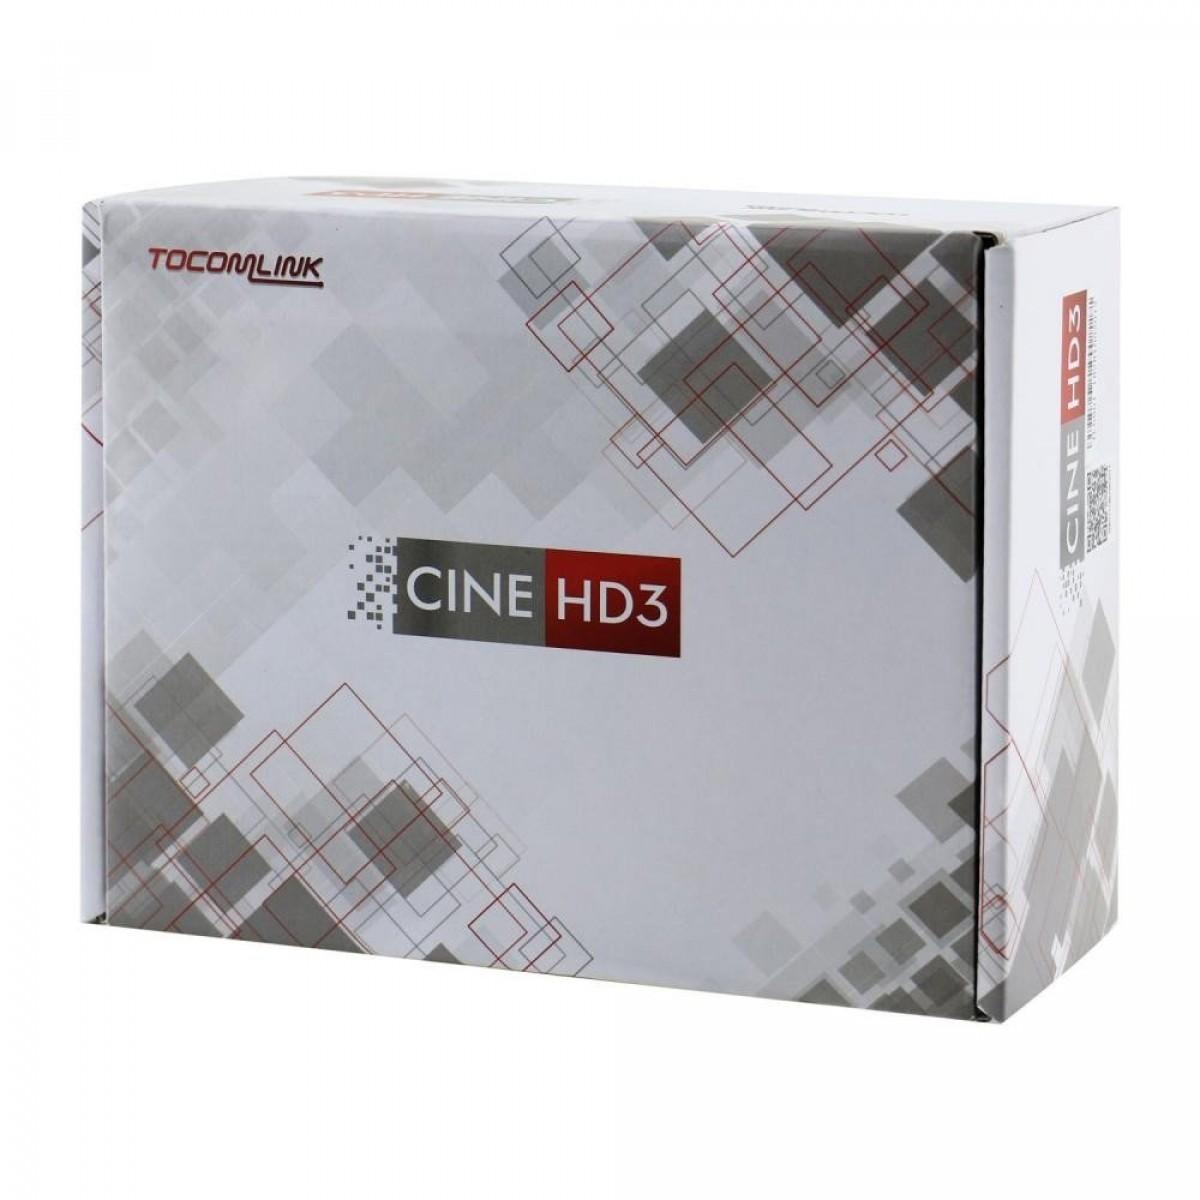 Tocomlink Cine HD3  SATELITE